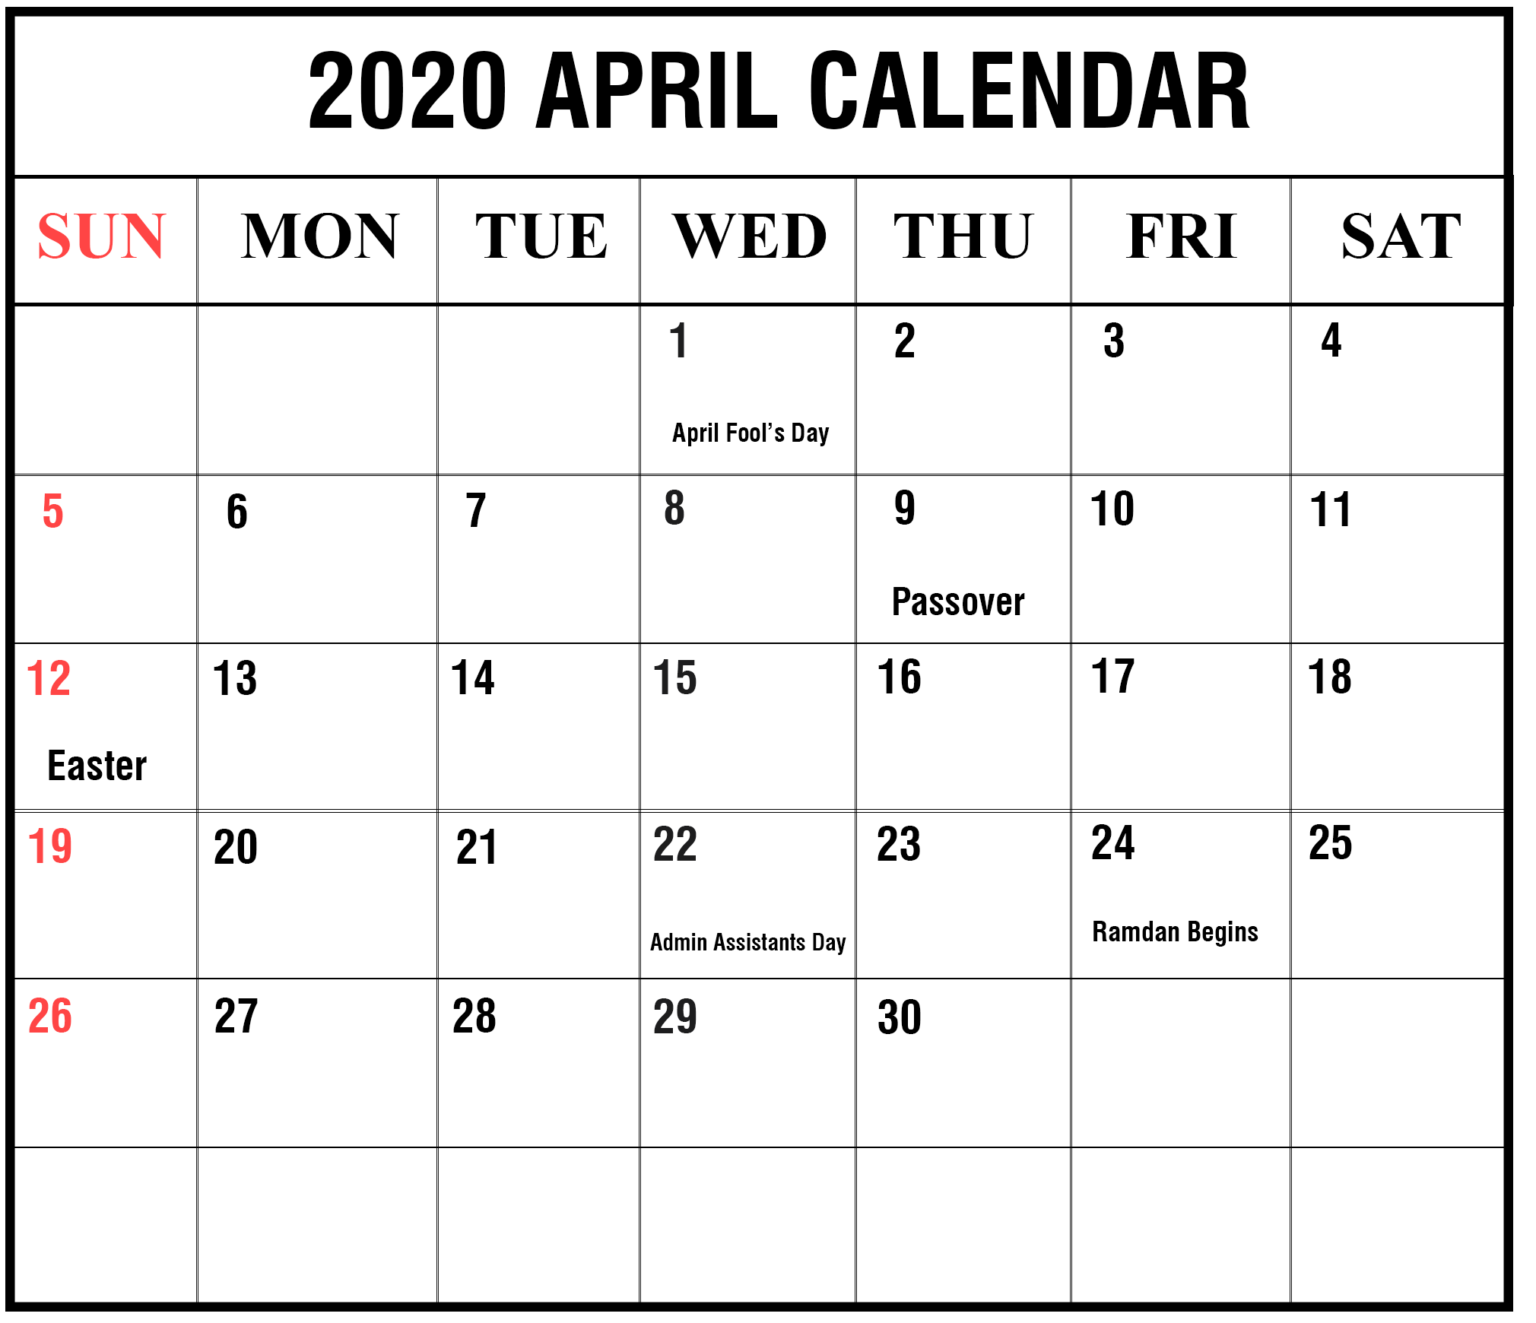 Printable April 2020 Calendar With Holidays Plan Free Printable Calendar Temp Free Printable Calendar Templates Custom Calendar Printable Calendar Template